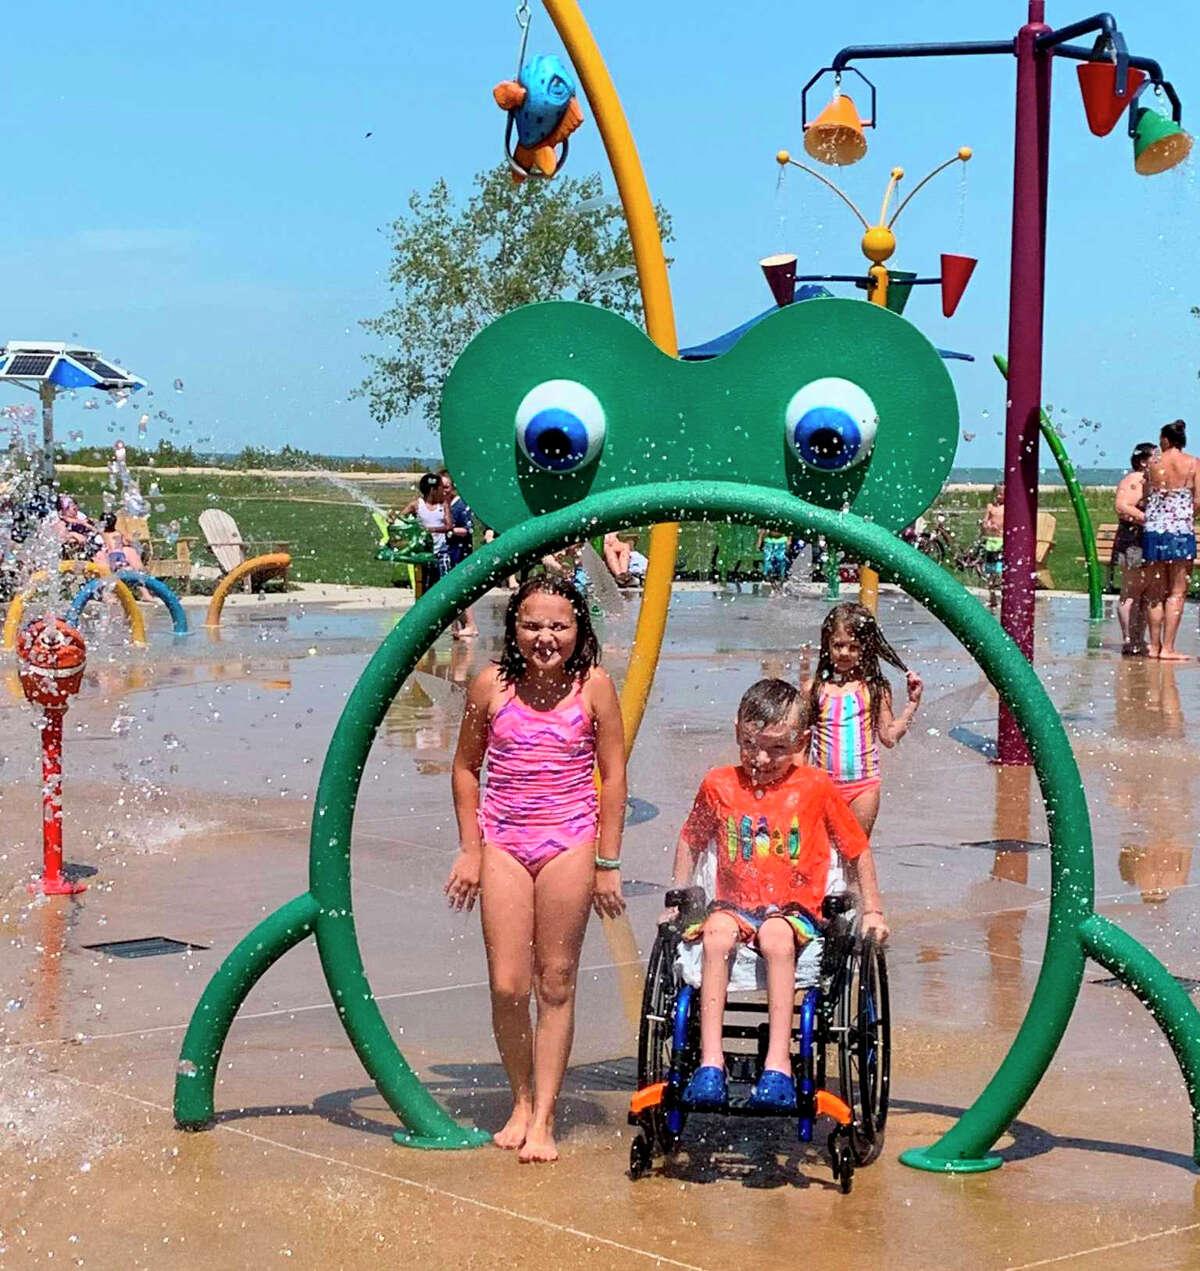 Chase and his sister Kennadi enjoying the splash pad in Bay City.